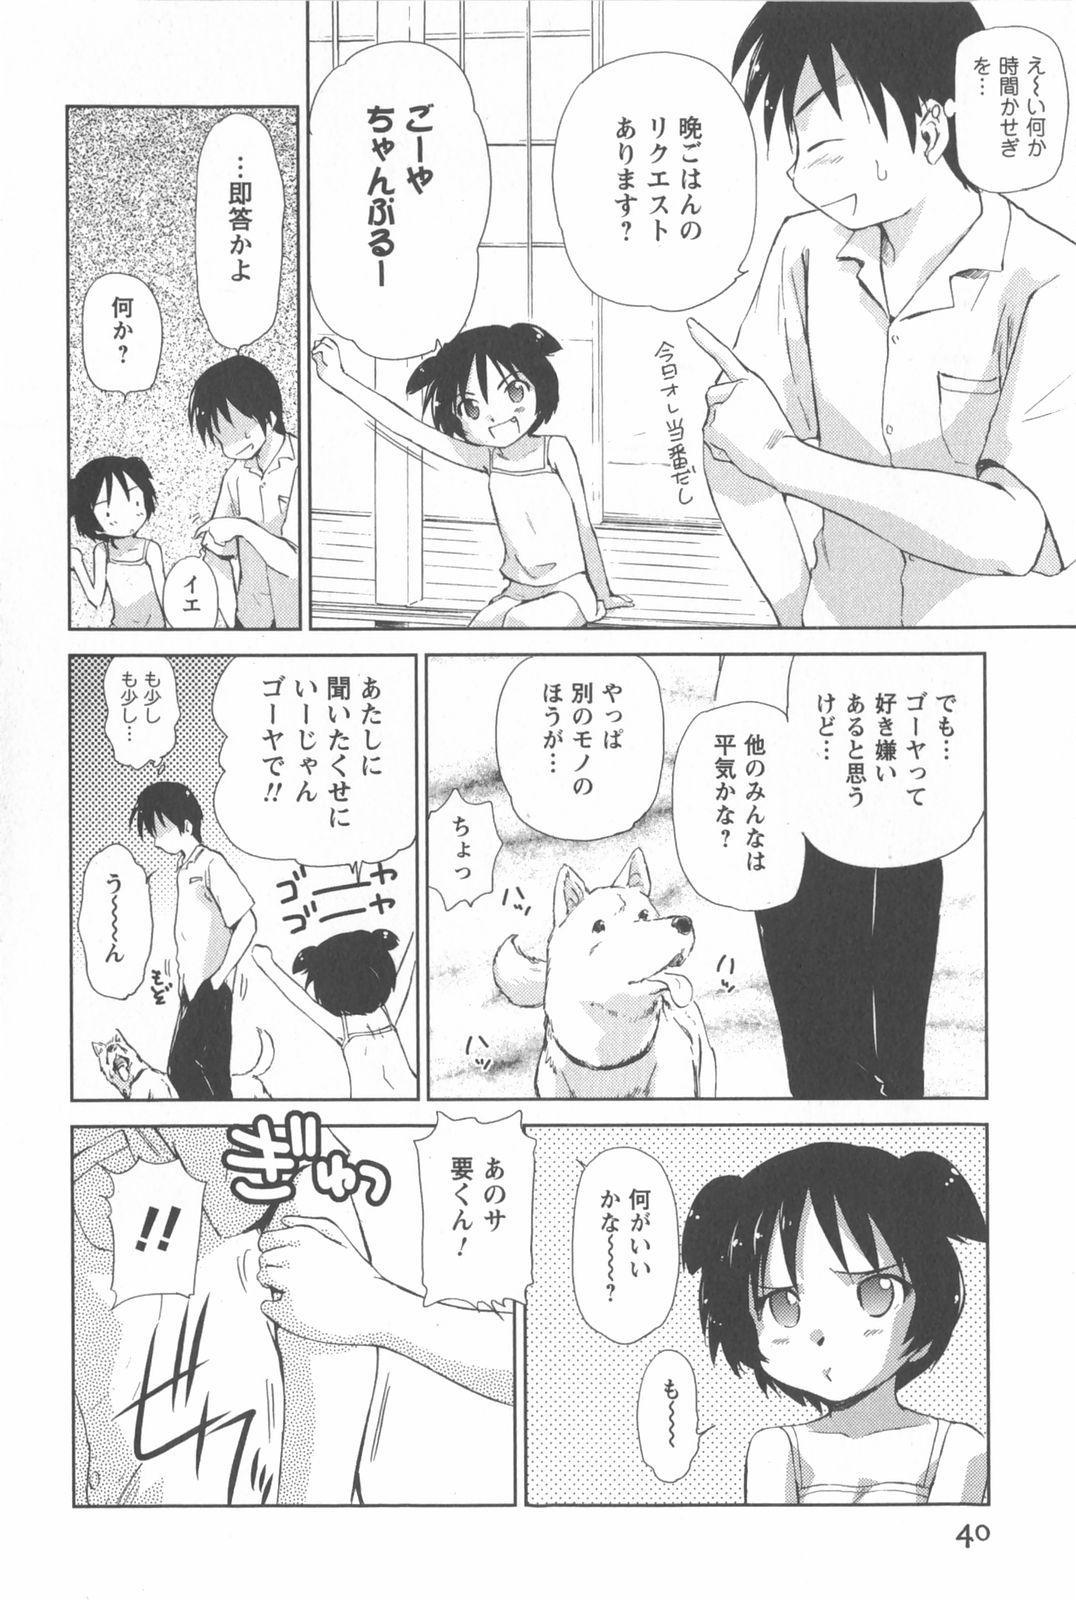 Momoiro Peanuts Vol. 2 42